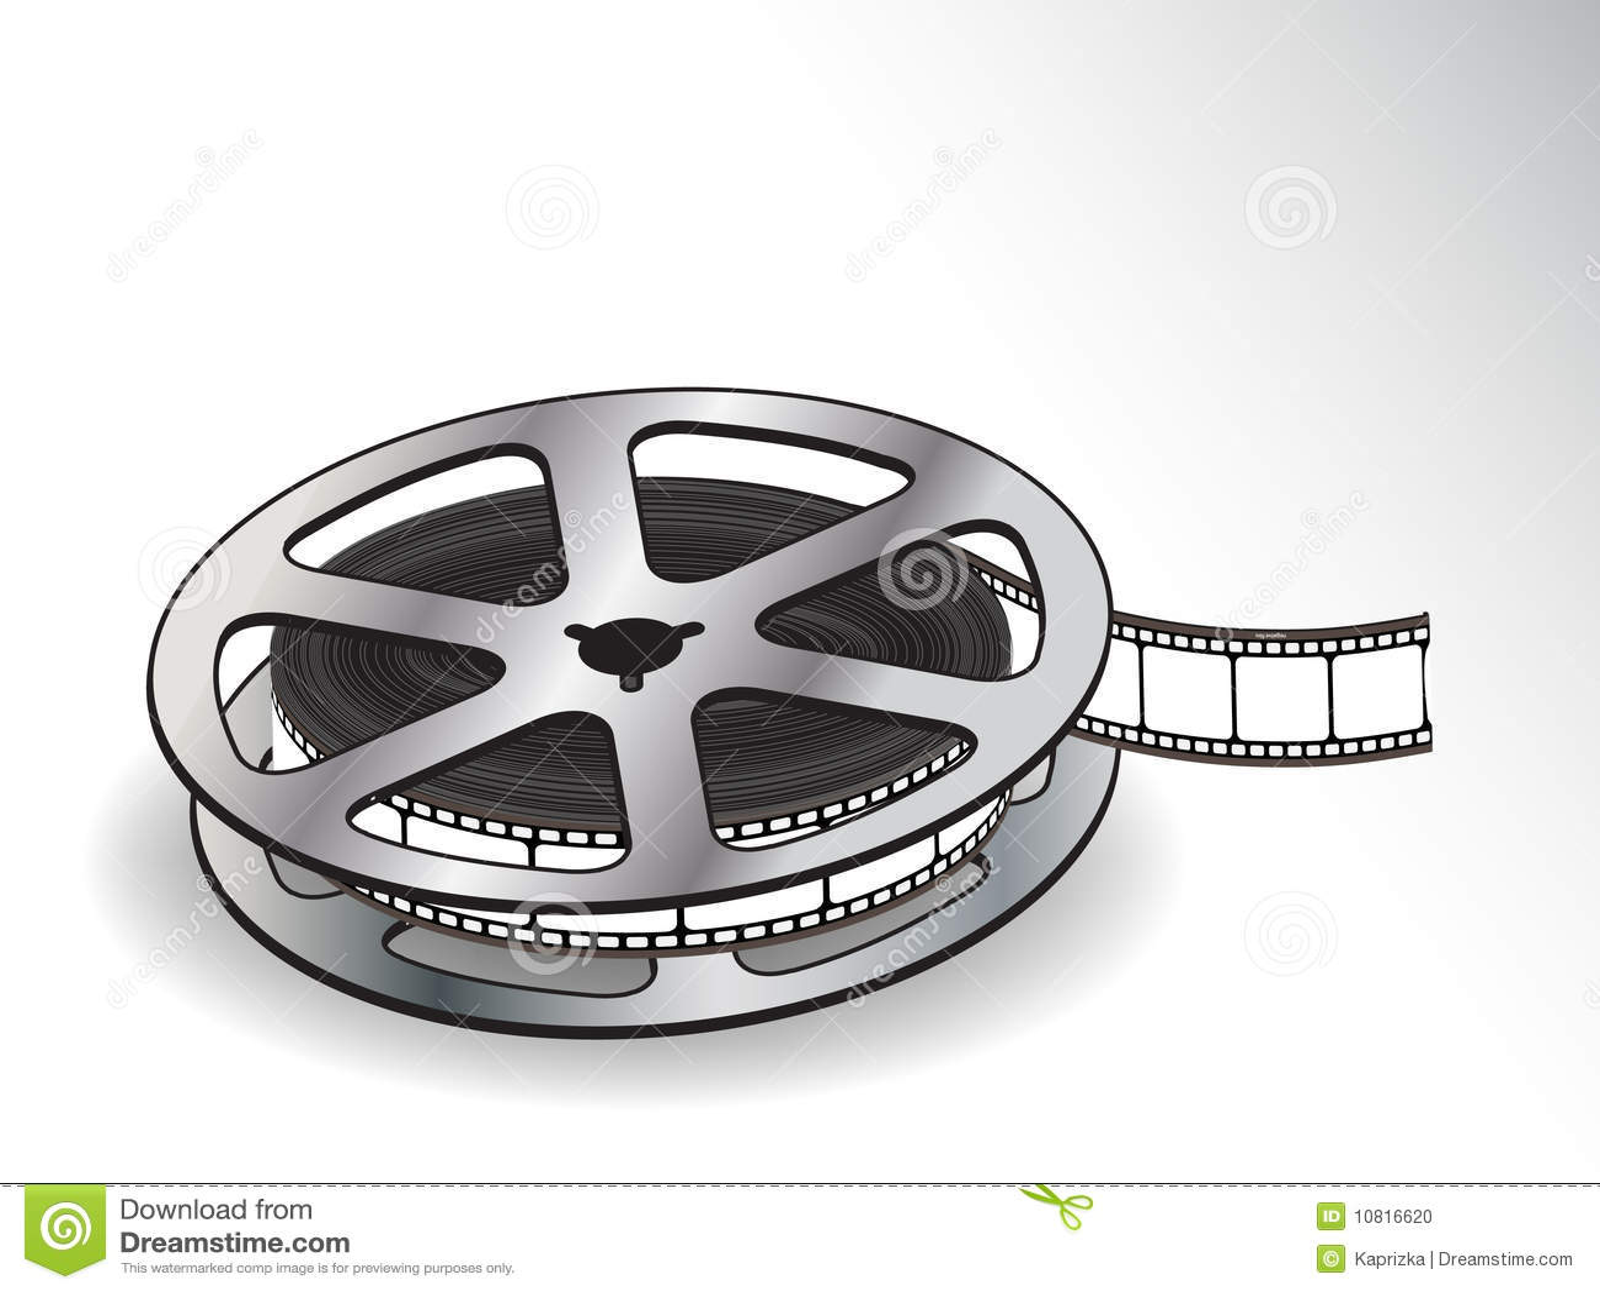 clipart pellicola cinematografica - photo #30